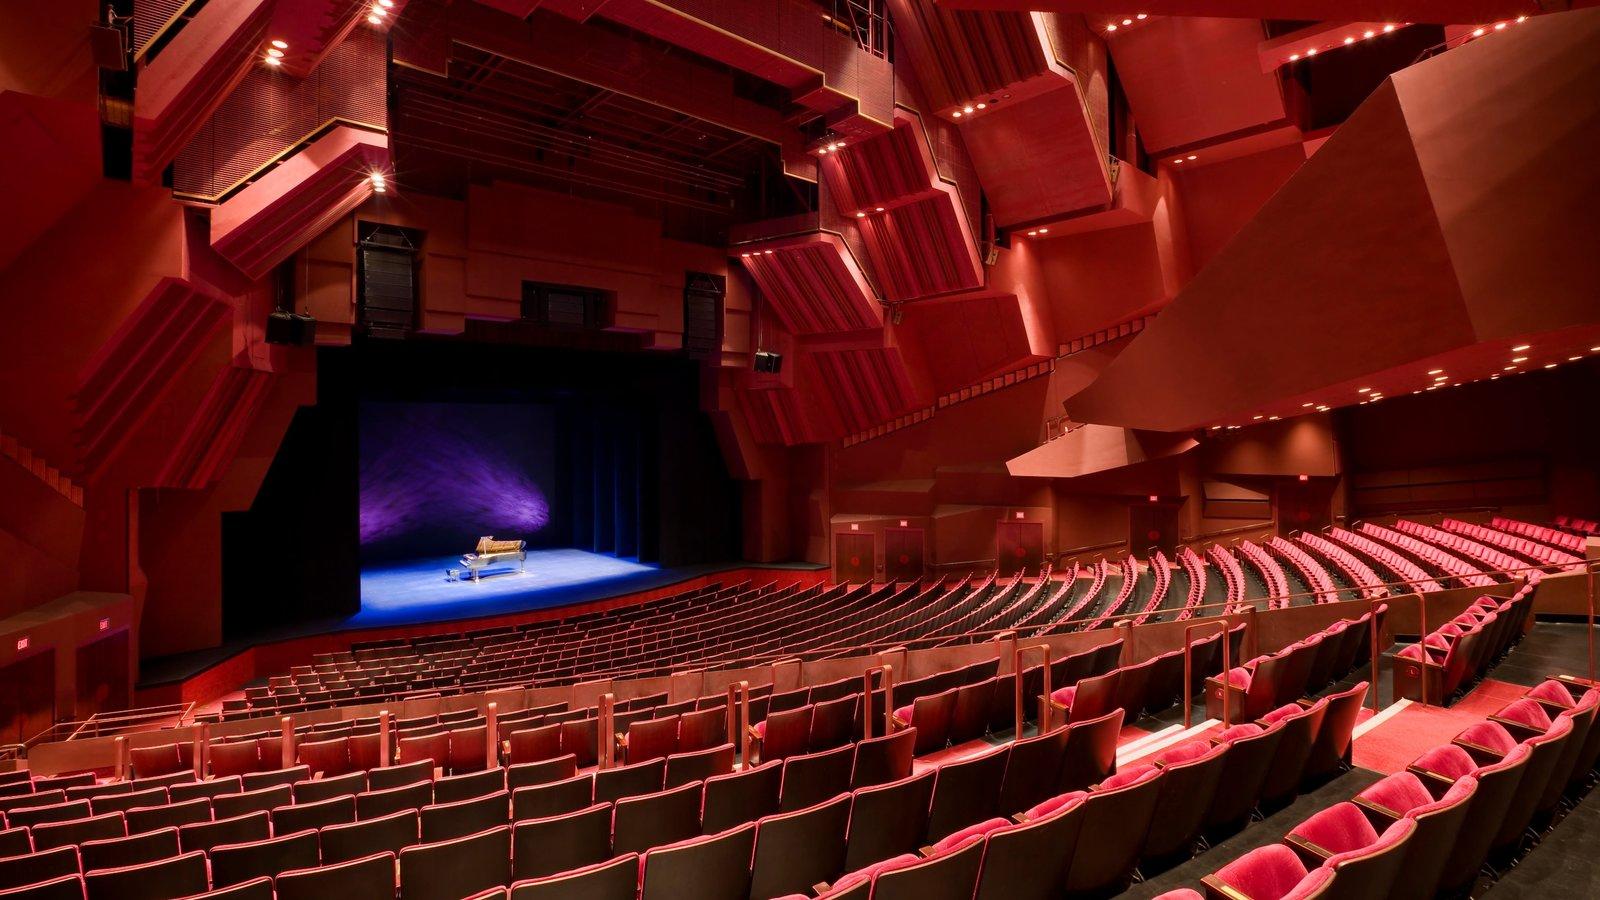 Segerstrom Center for the Arts caracterizando vistas internas e cenas de teatro